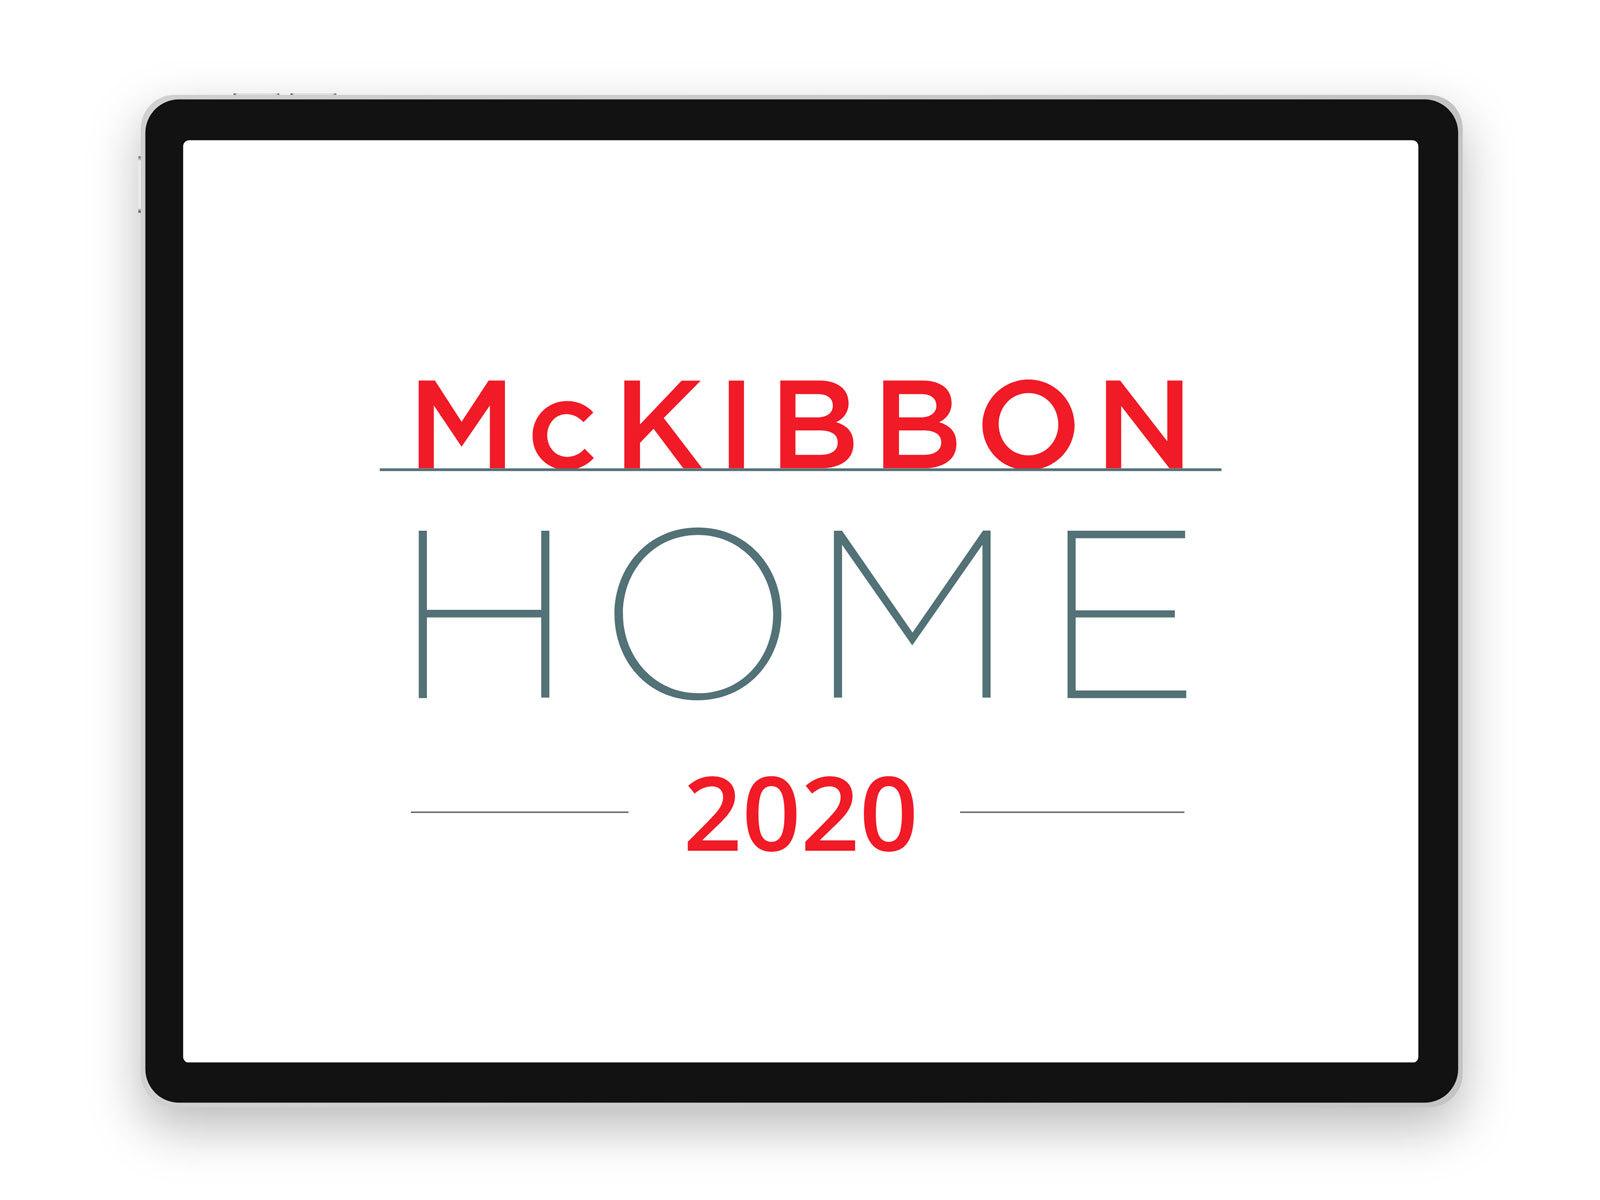 McKibbon Home - 2020 Goals Image